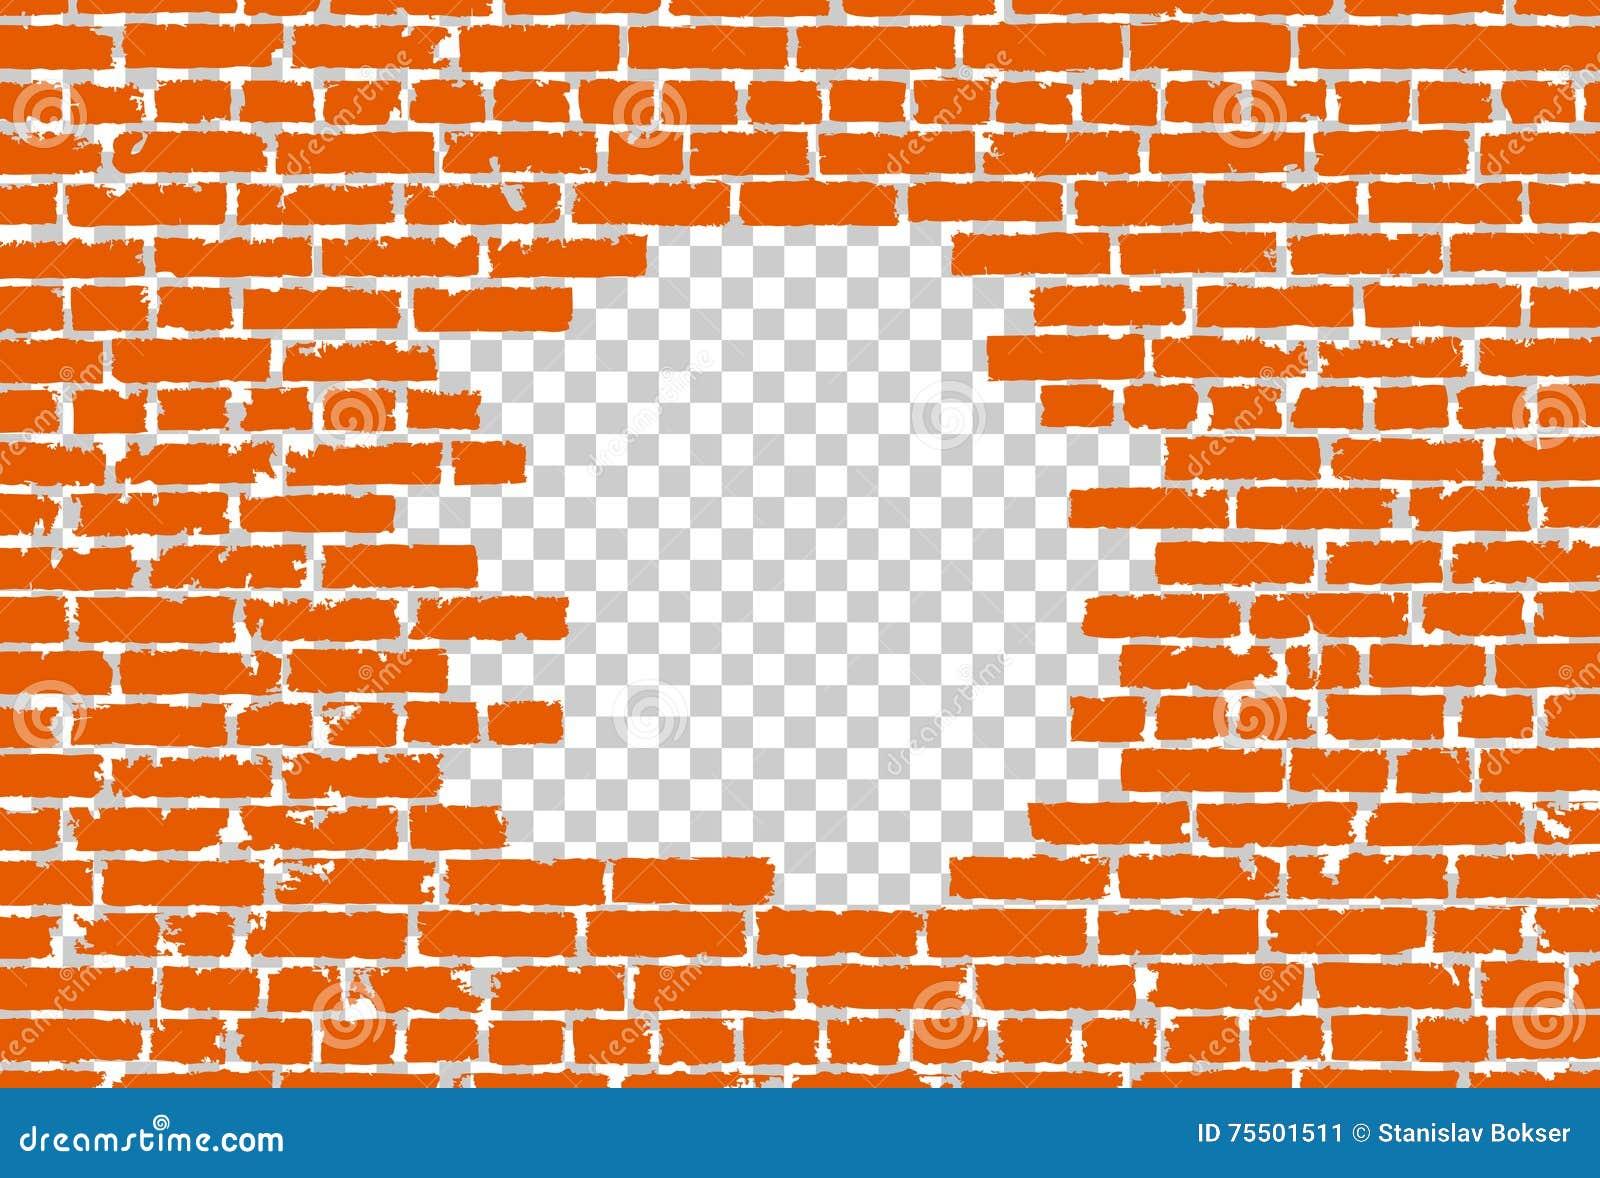 Orange Broken Realistic Old Black Brick Wall Concept On Transparent